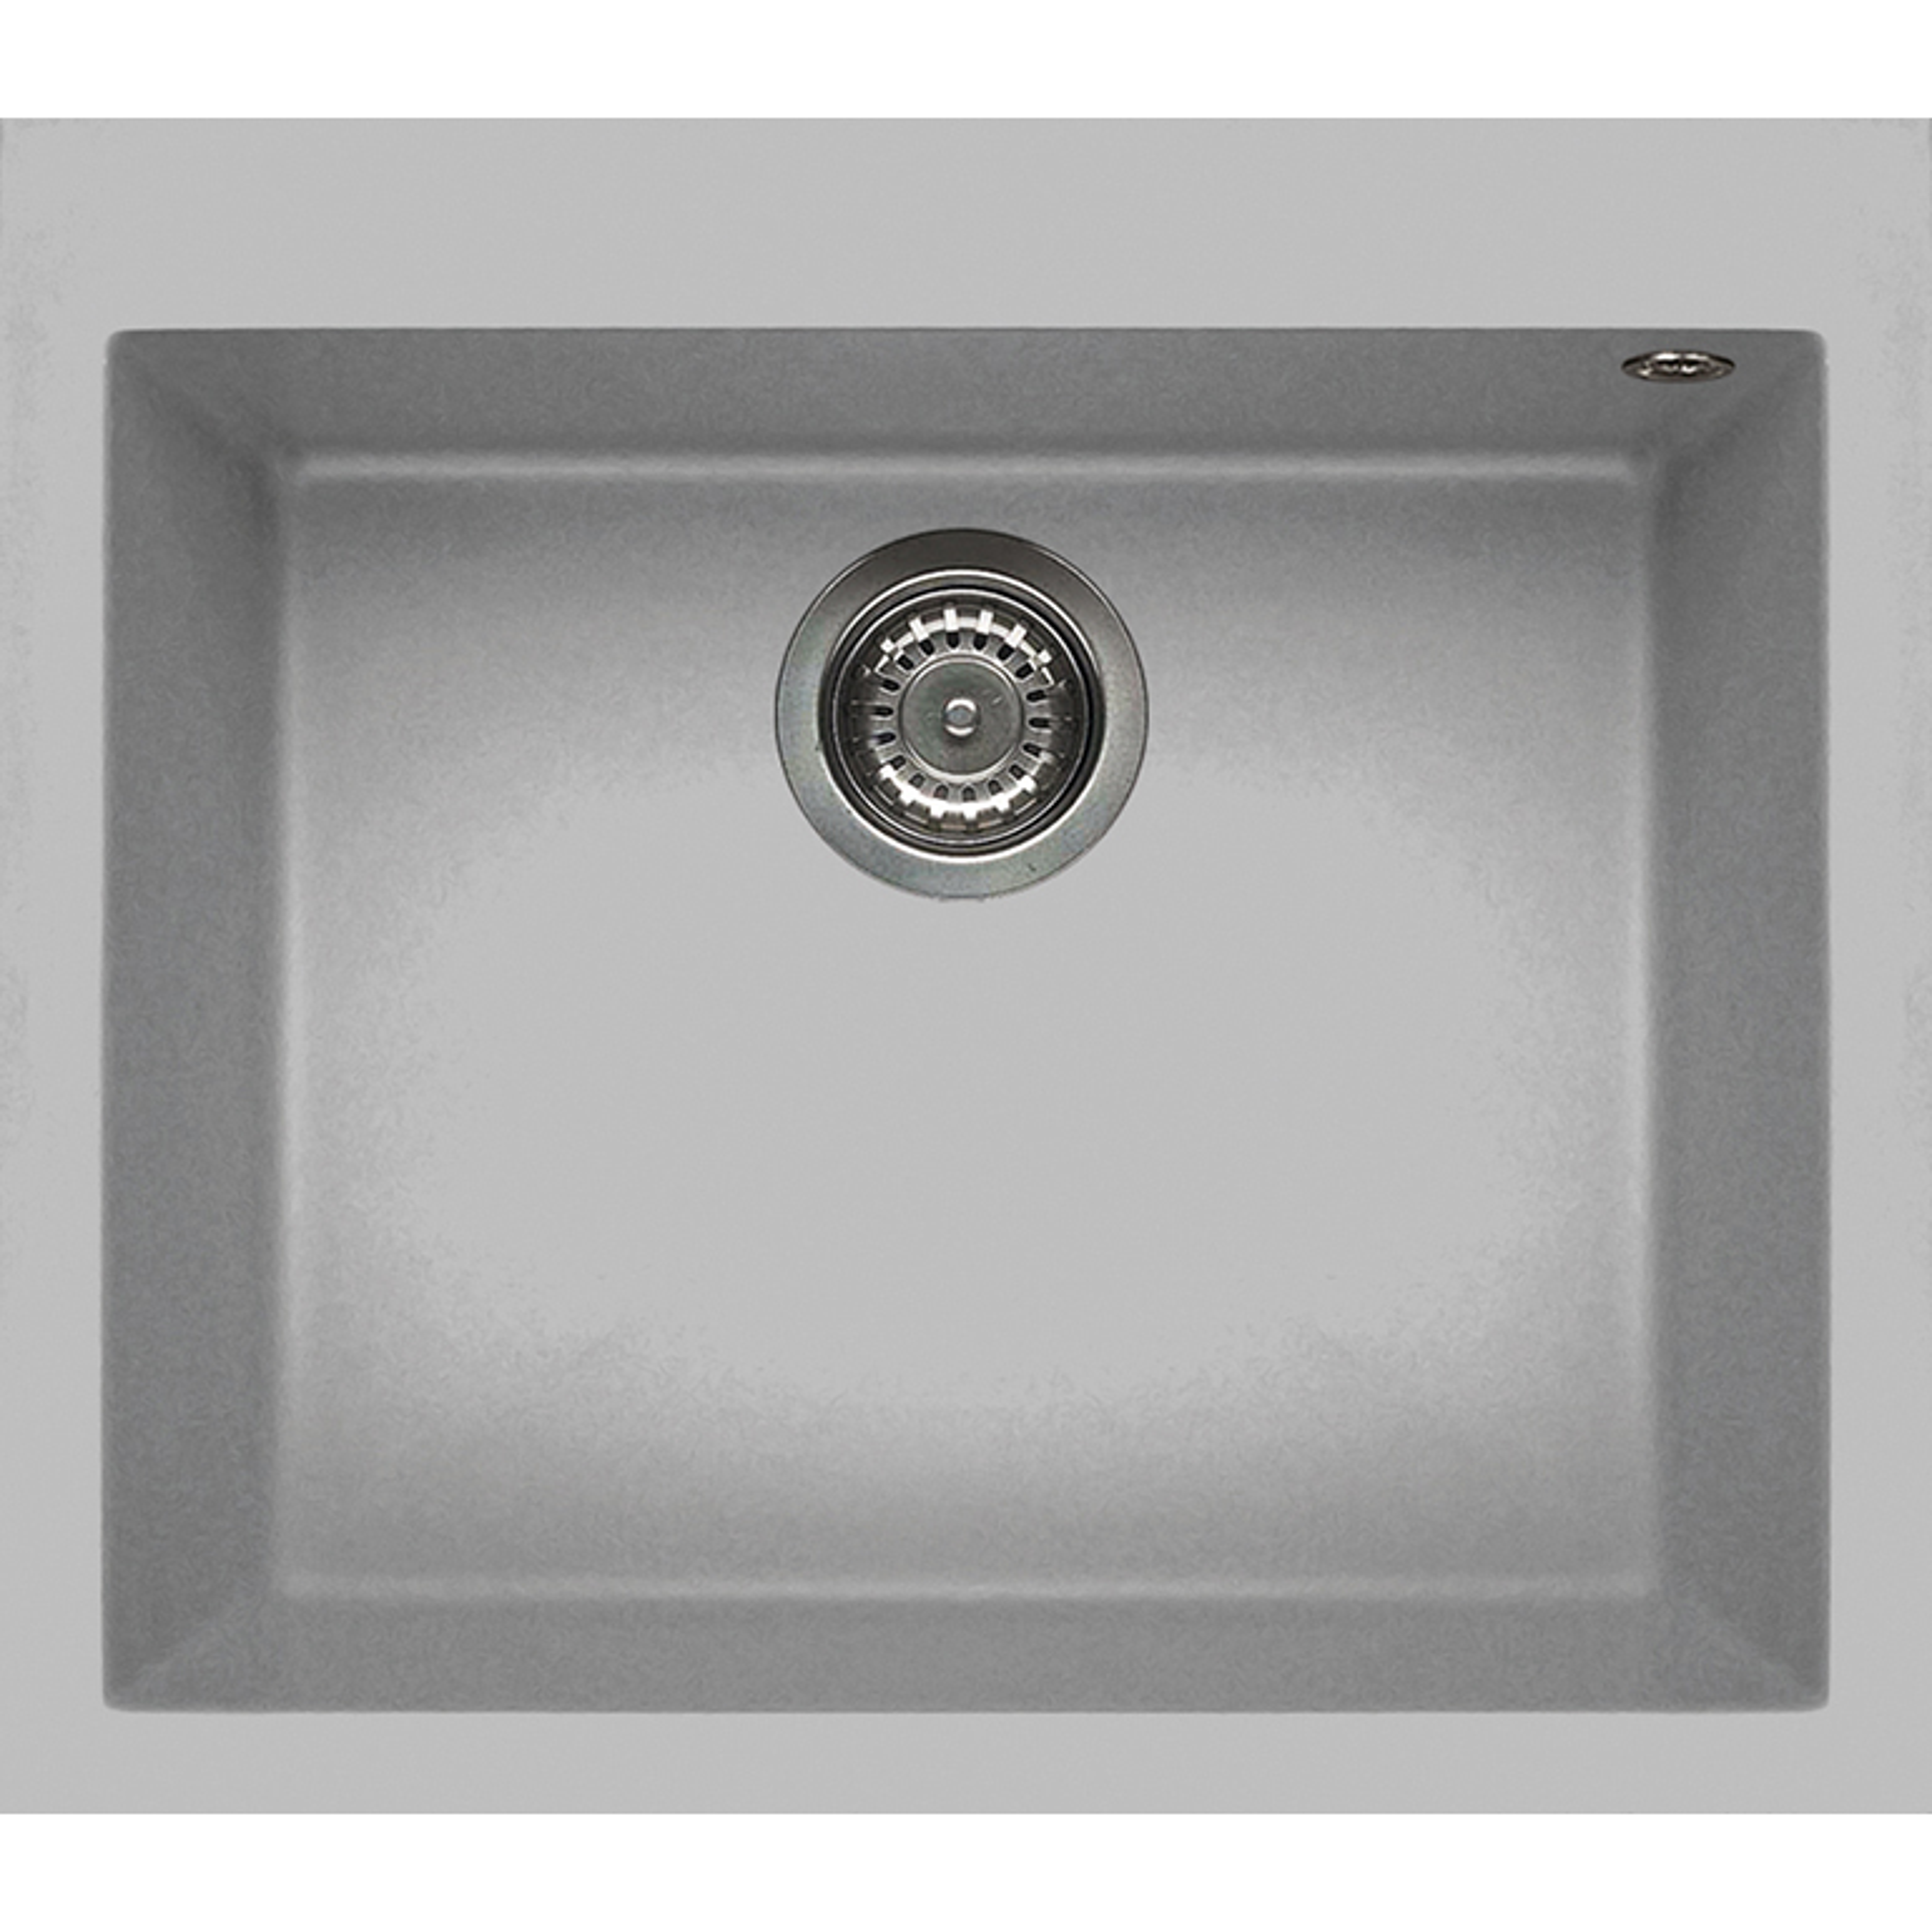 Elleci花崗岩含金屬水槽Quadra105(鋁色)